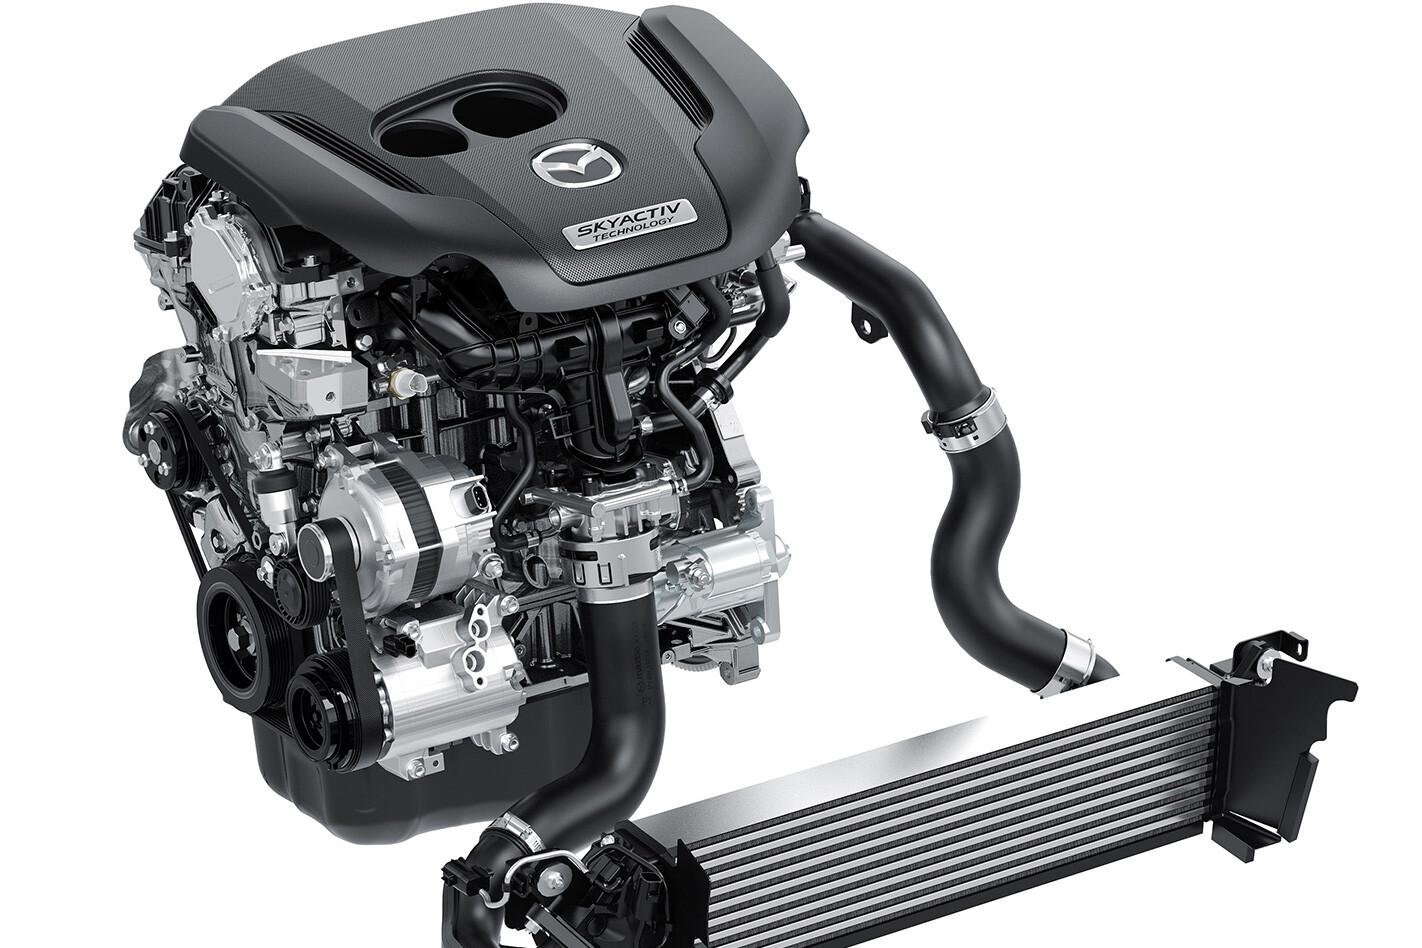 Mazda Turbo Cx 9 Engine Jpg